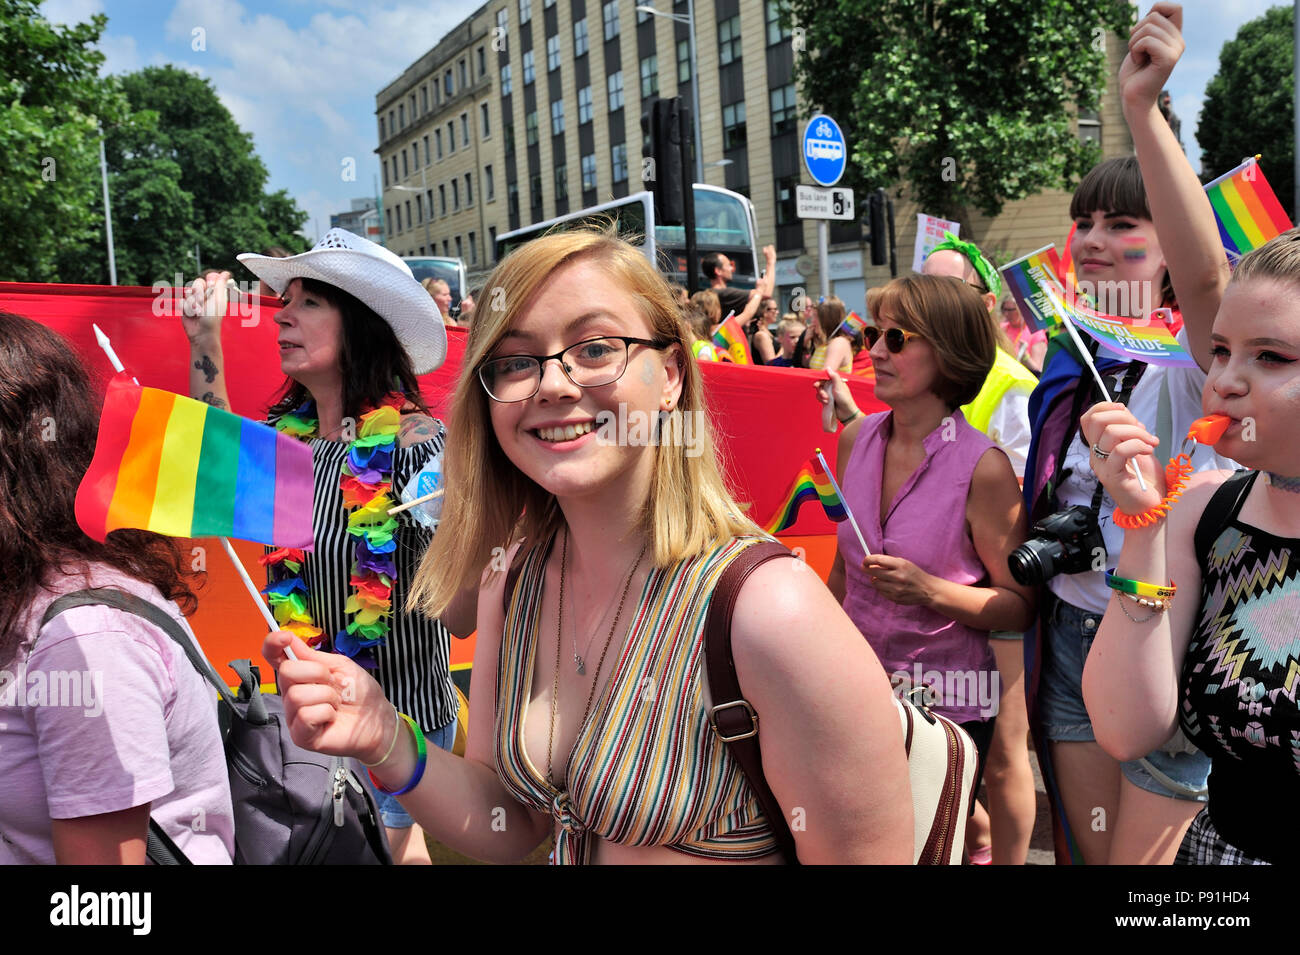 gay incontri Bristol UK Alberta Senior Dating gratis